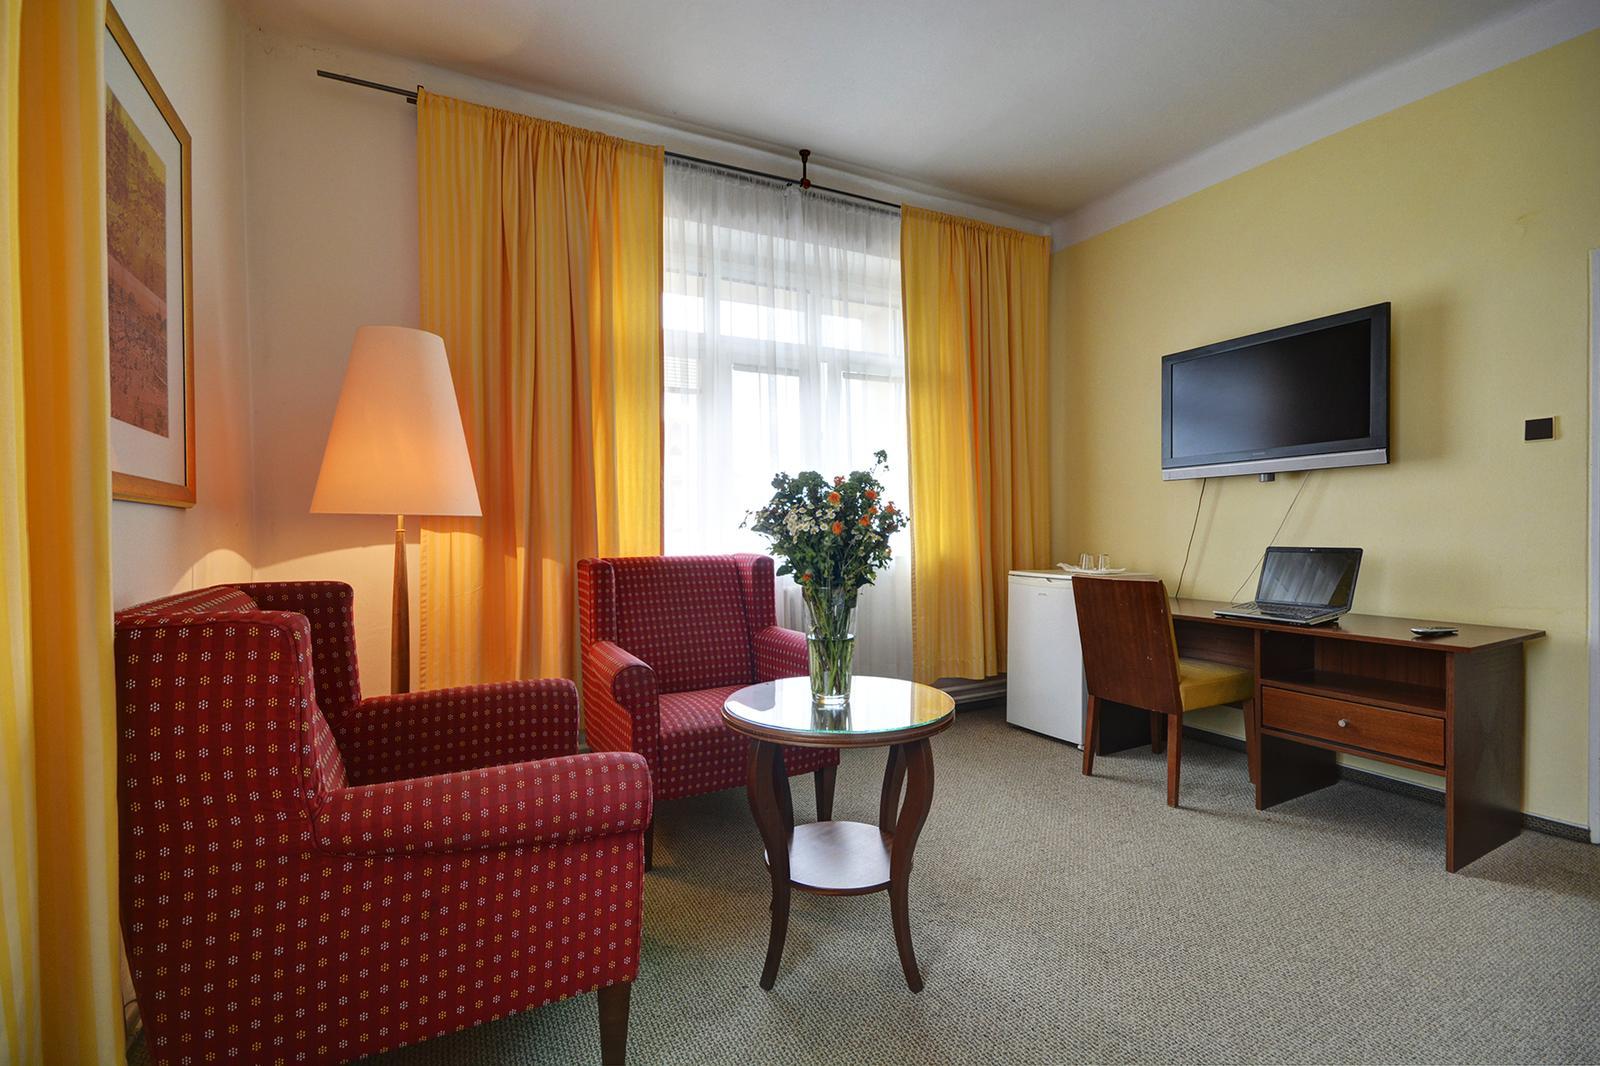 Svatby 2016 - Apartmán